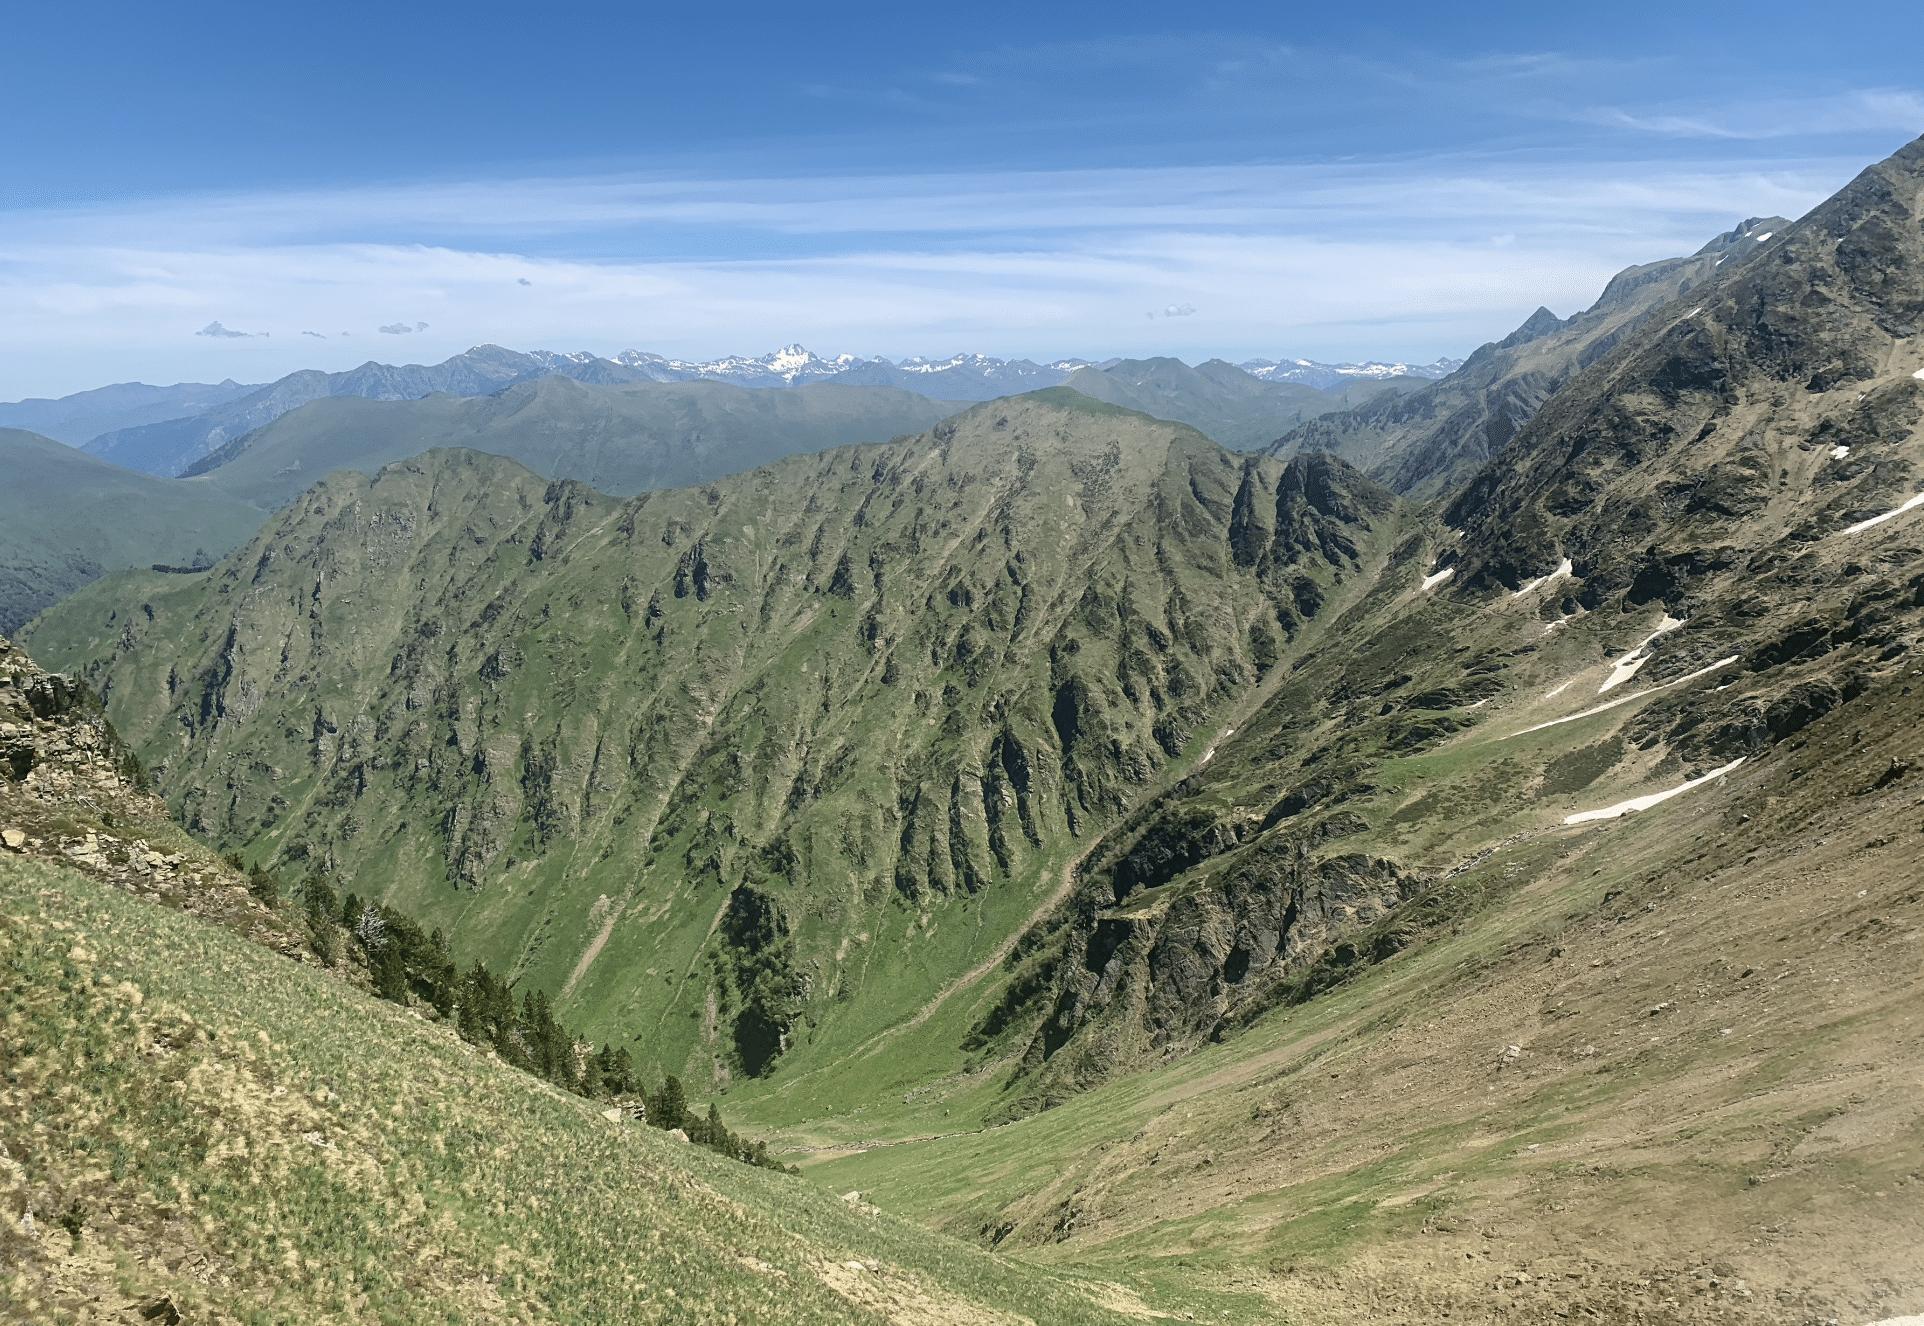 paysage randonnee pyrenees